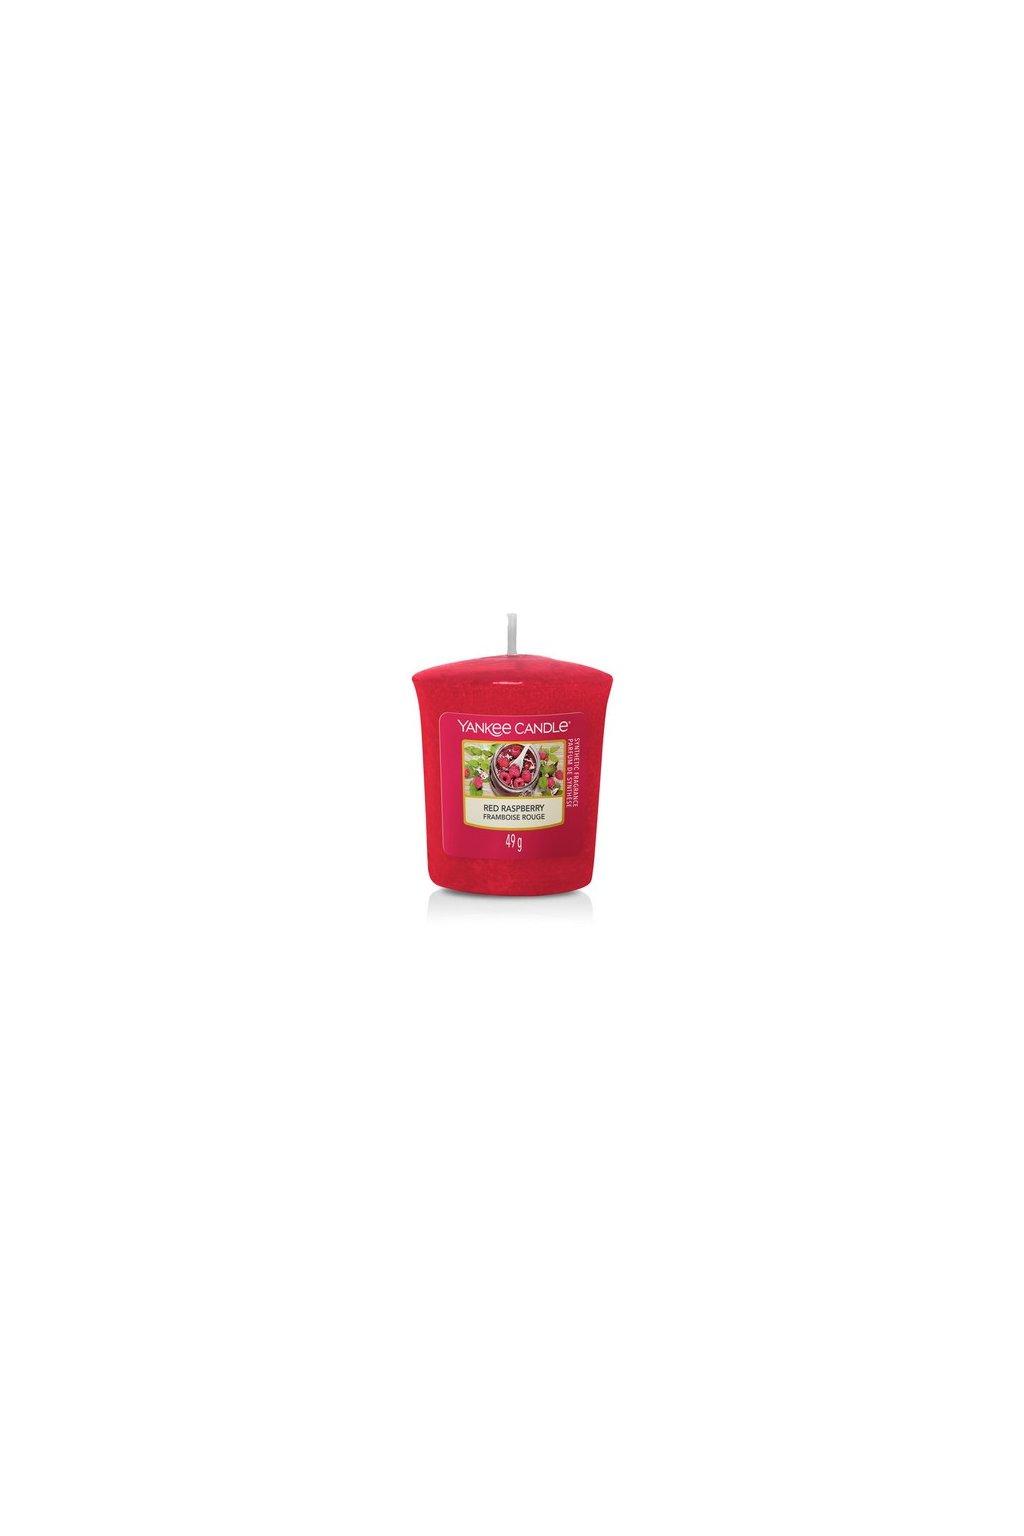 Yankee Candle Red Raspberry 49g